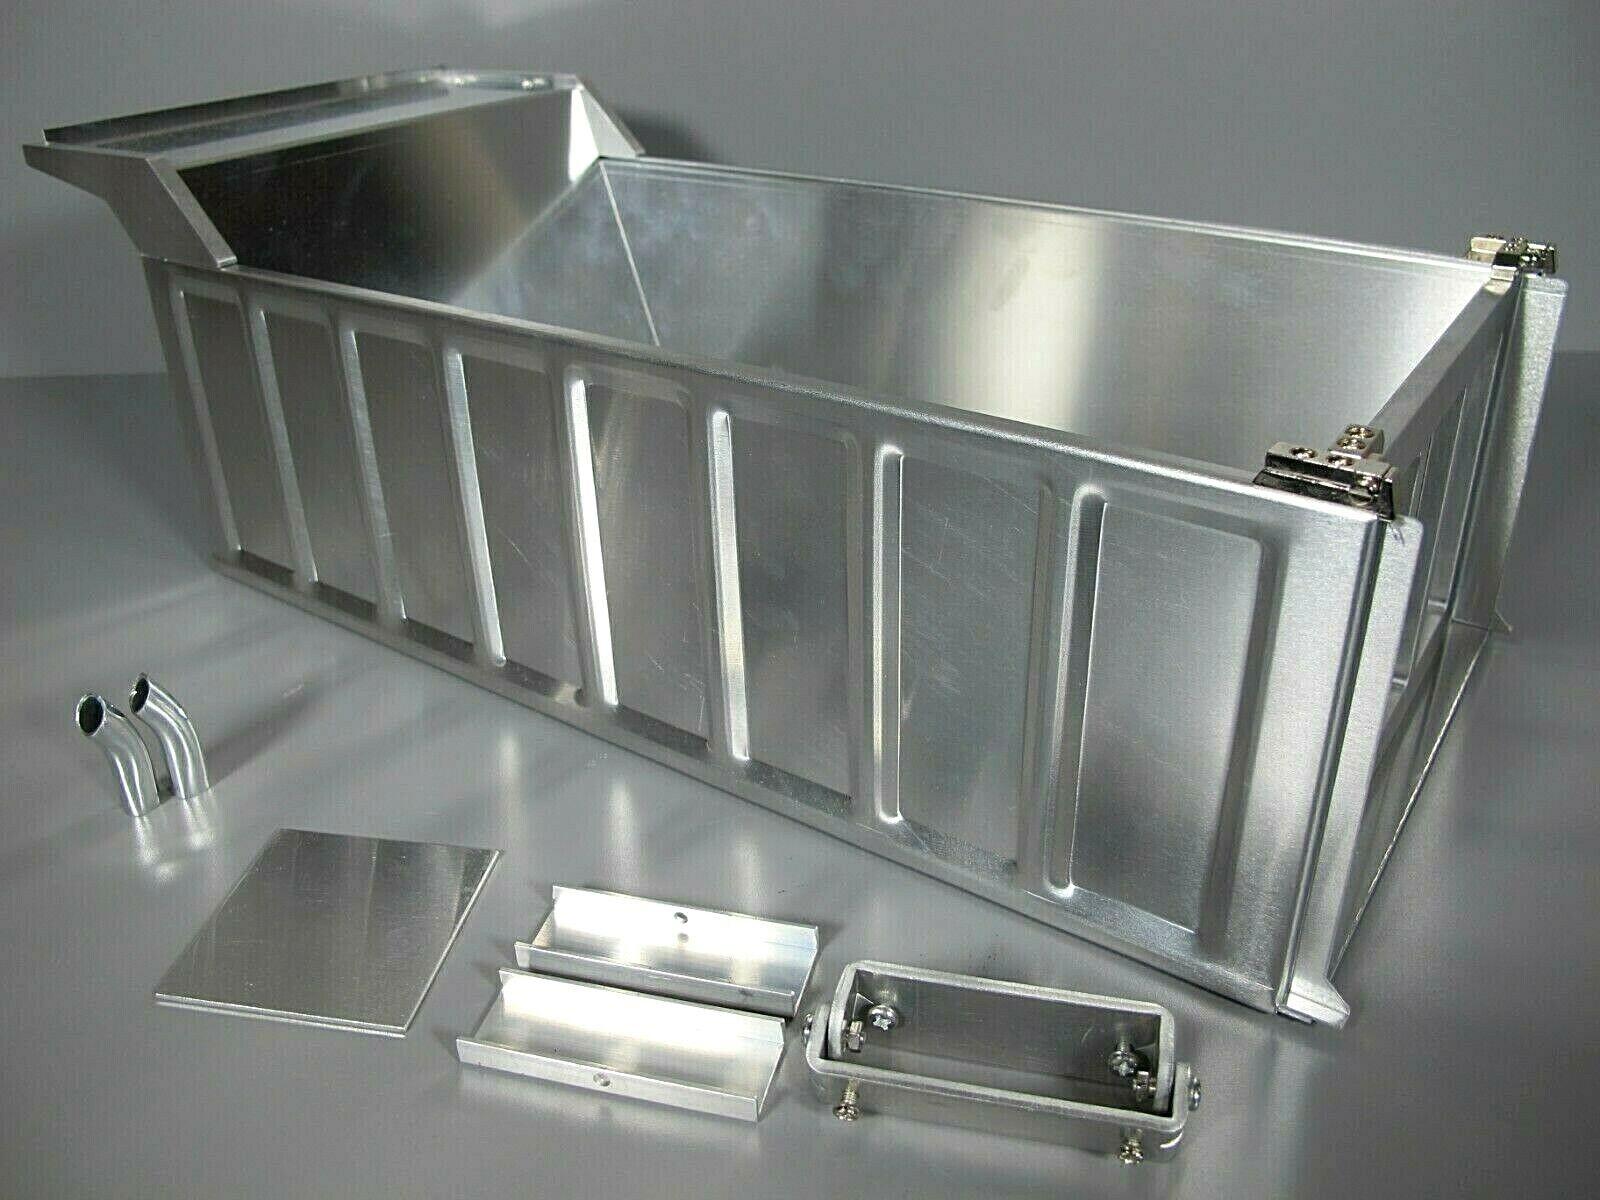 Kongröneringa av aluminiumsäng Tamiya 1 14 R C Toy King Grand Hauler Aeromax